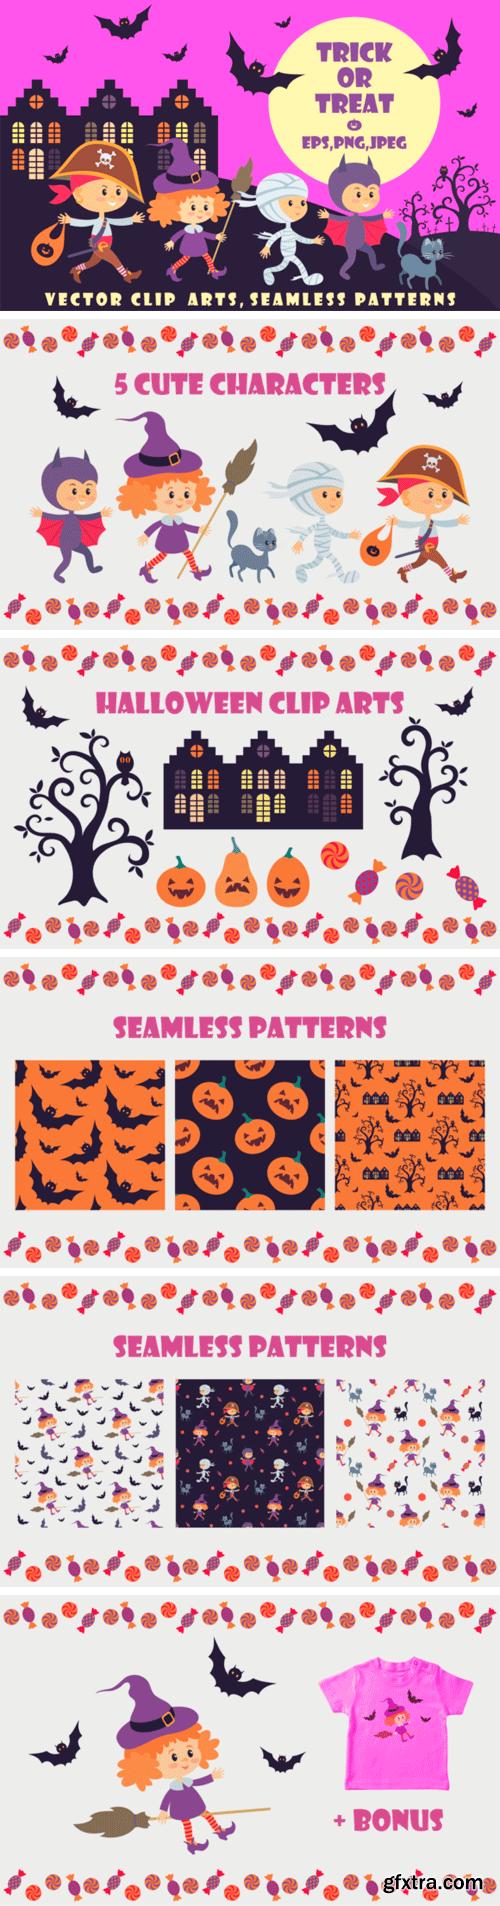 Trick or Treat: 18 Children in Halloween Costumes